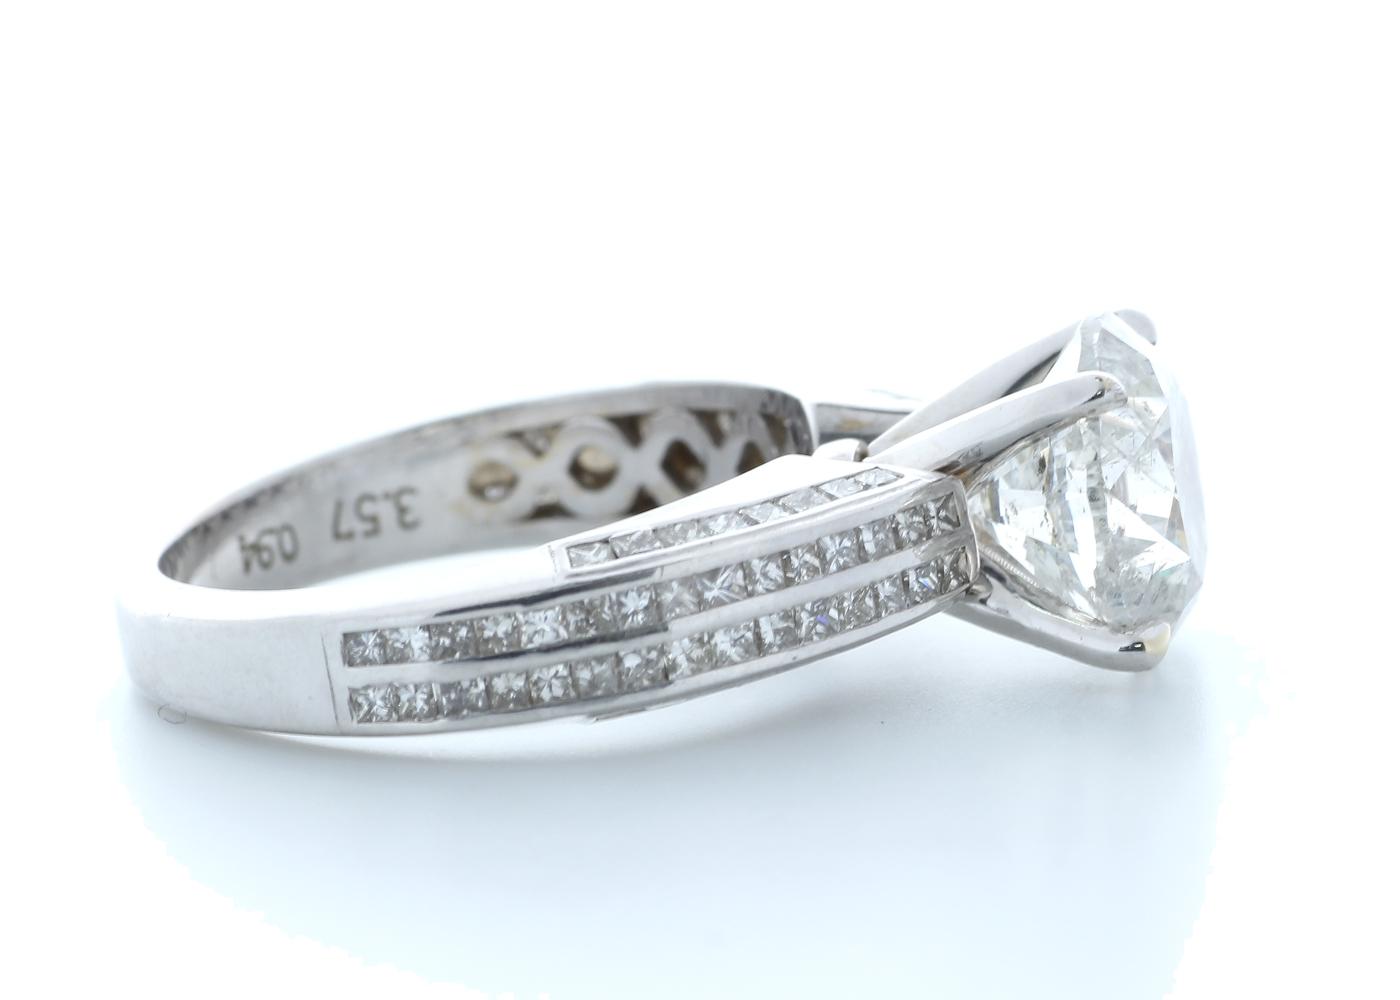 18ct White Gold Diamond Ring 4.51 (3.57) Carats - Image 4 of 5